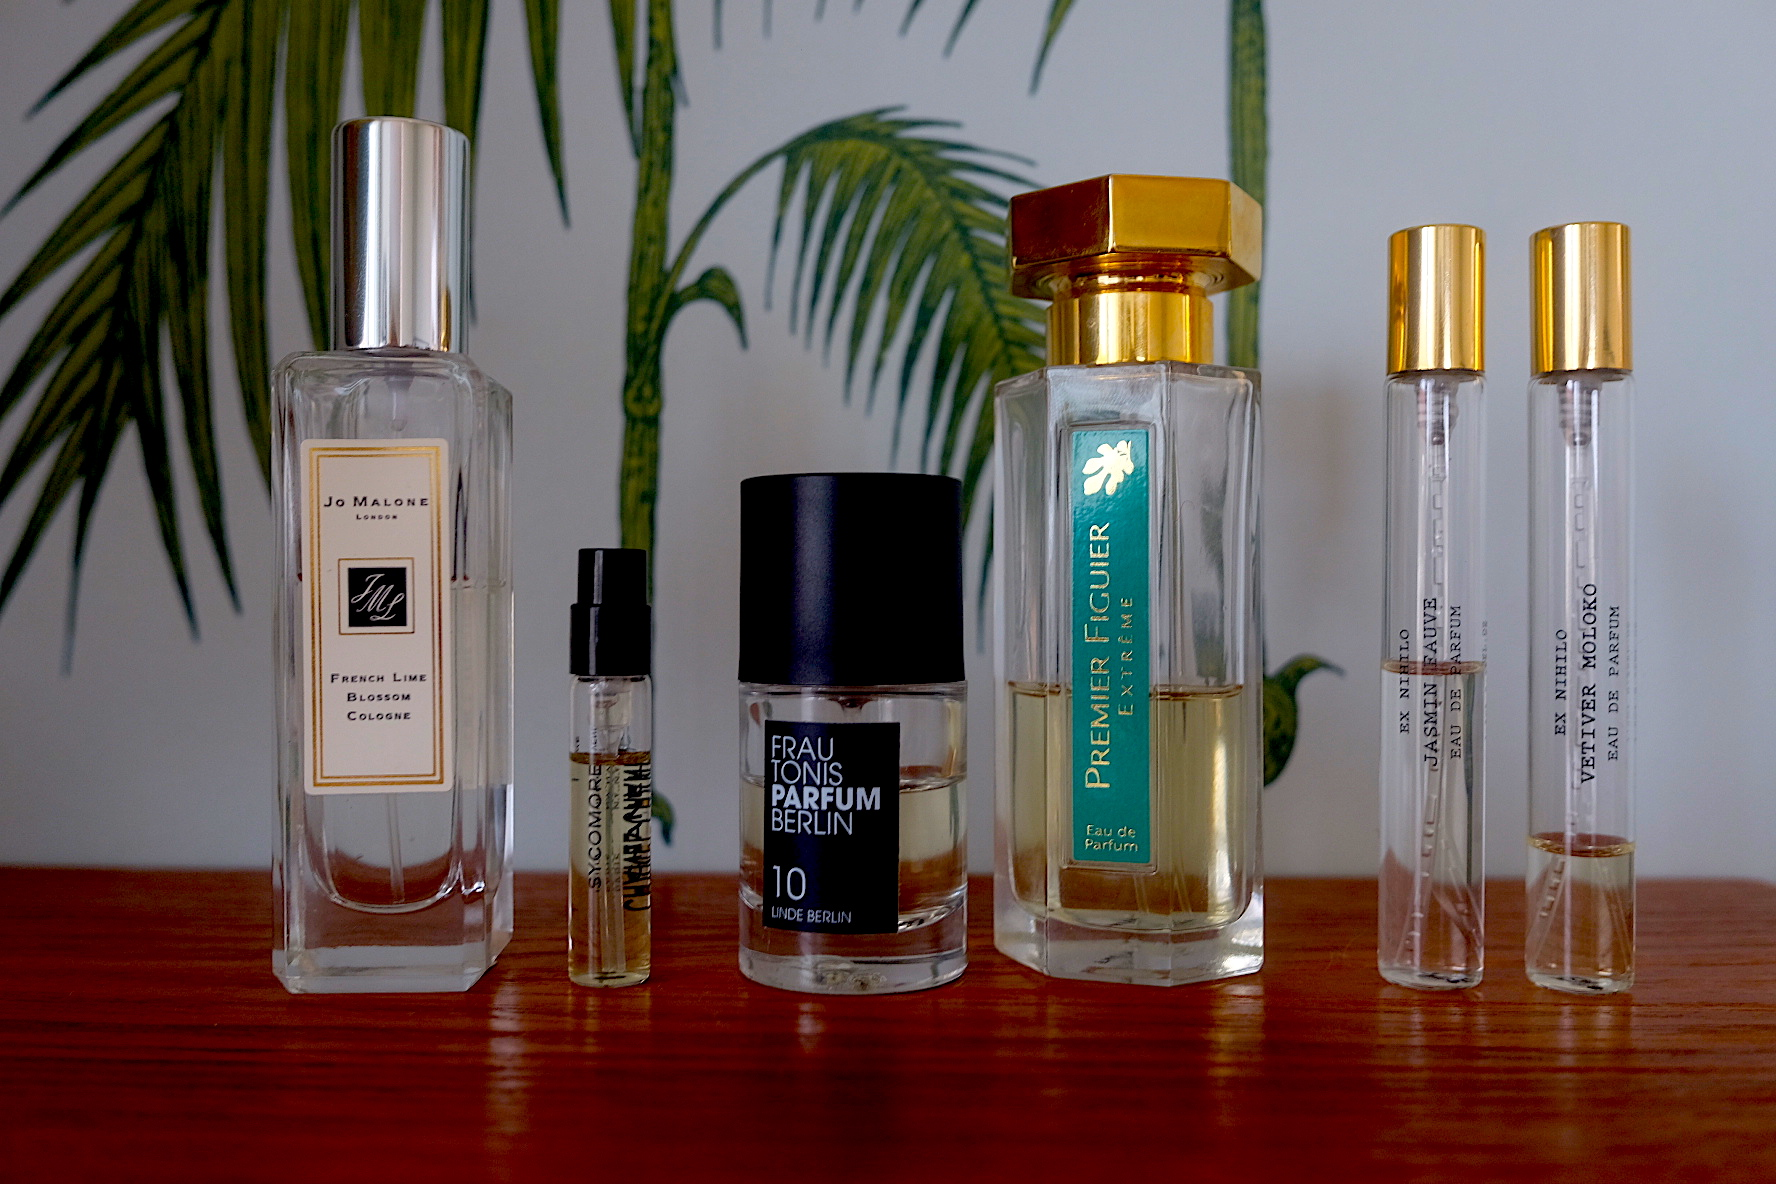 French Lime Blossom Cologne, Sycomore, Linde Berlin, Premier Figuier Extreme, Jasmin Fauve och Vetiver Moloko.